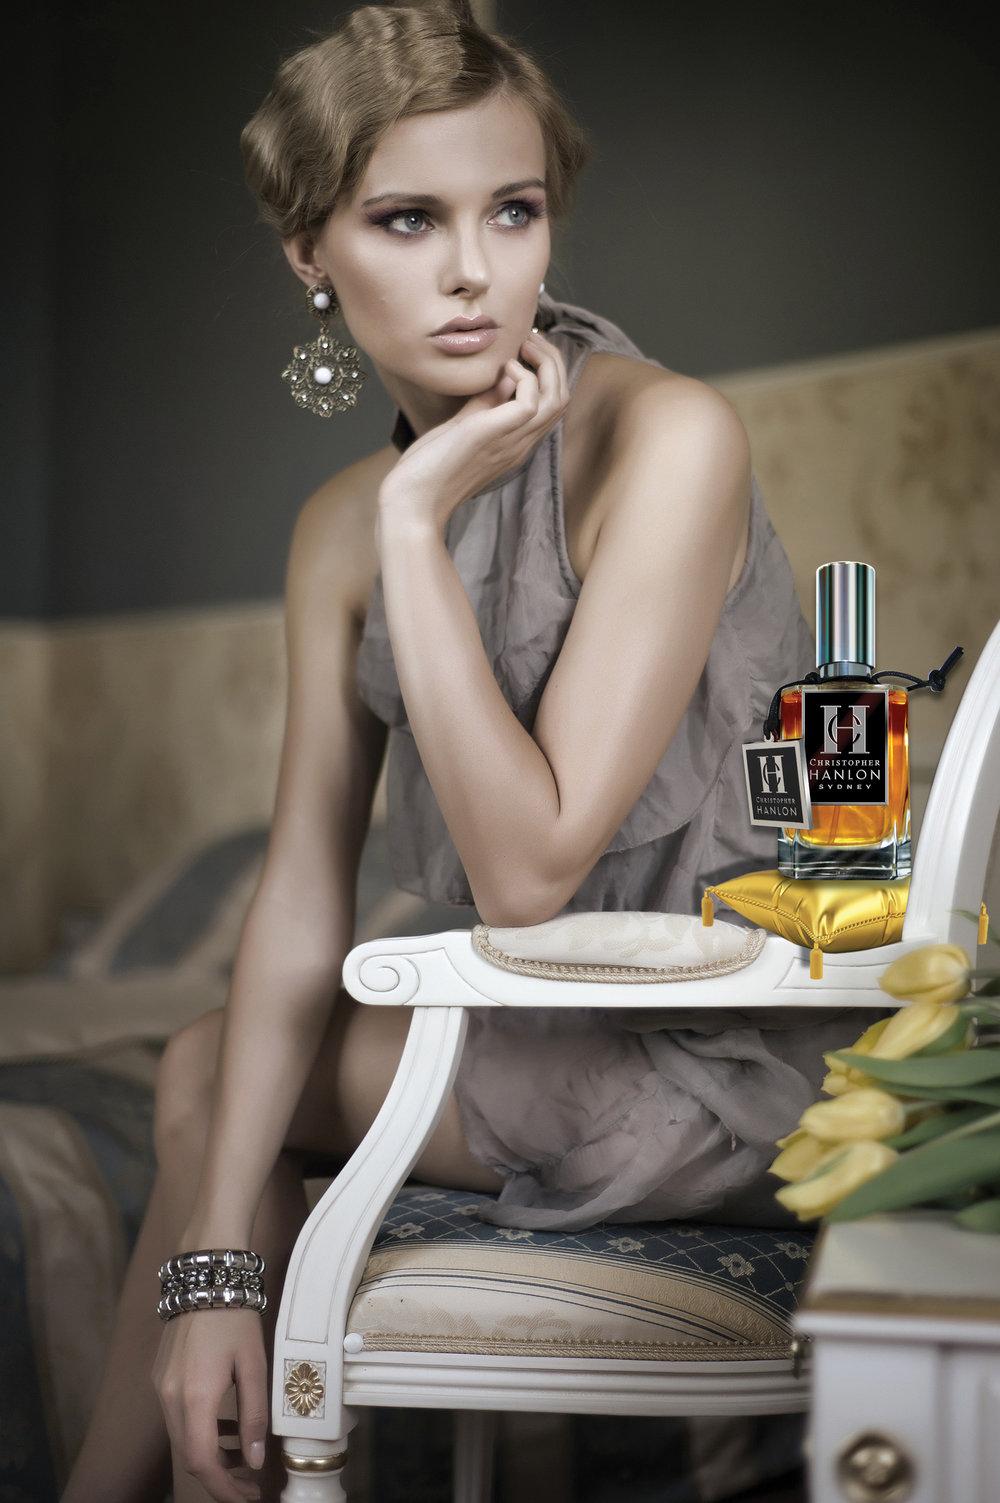 girl.perfume.hr copy copy.jpg